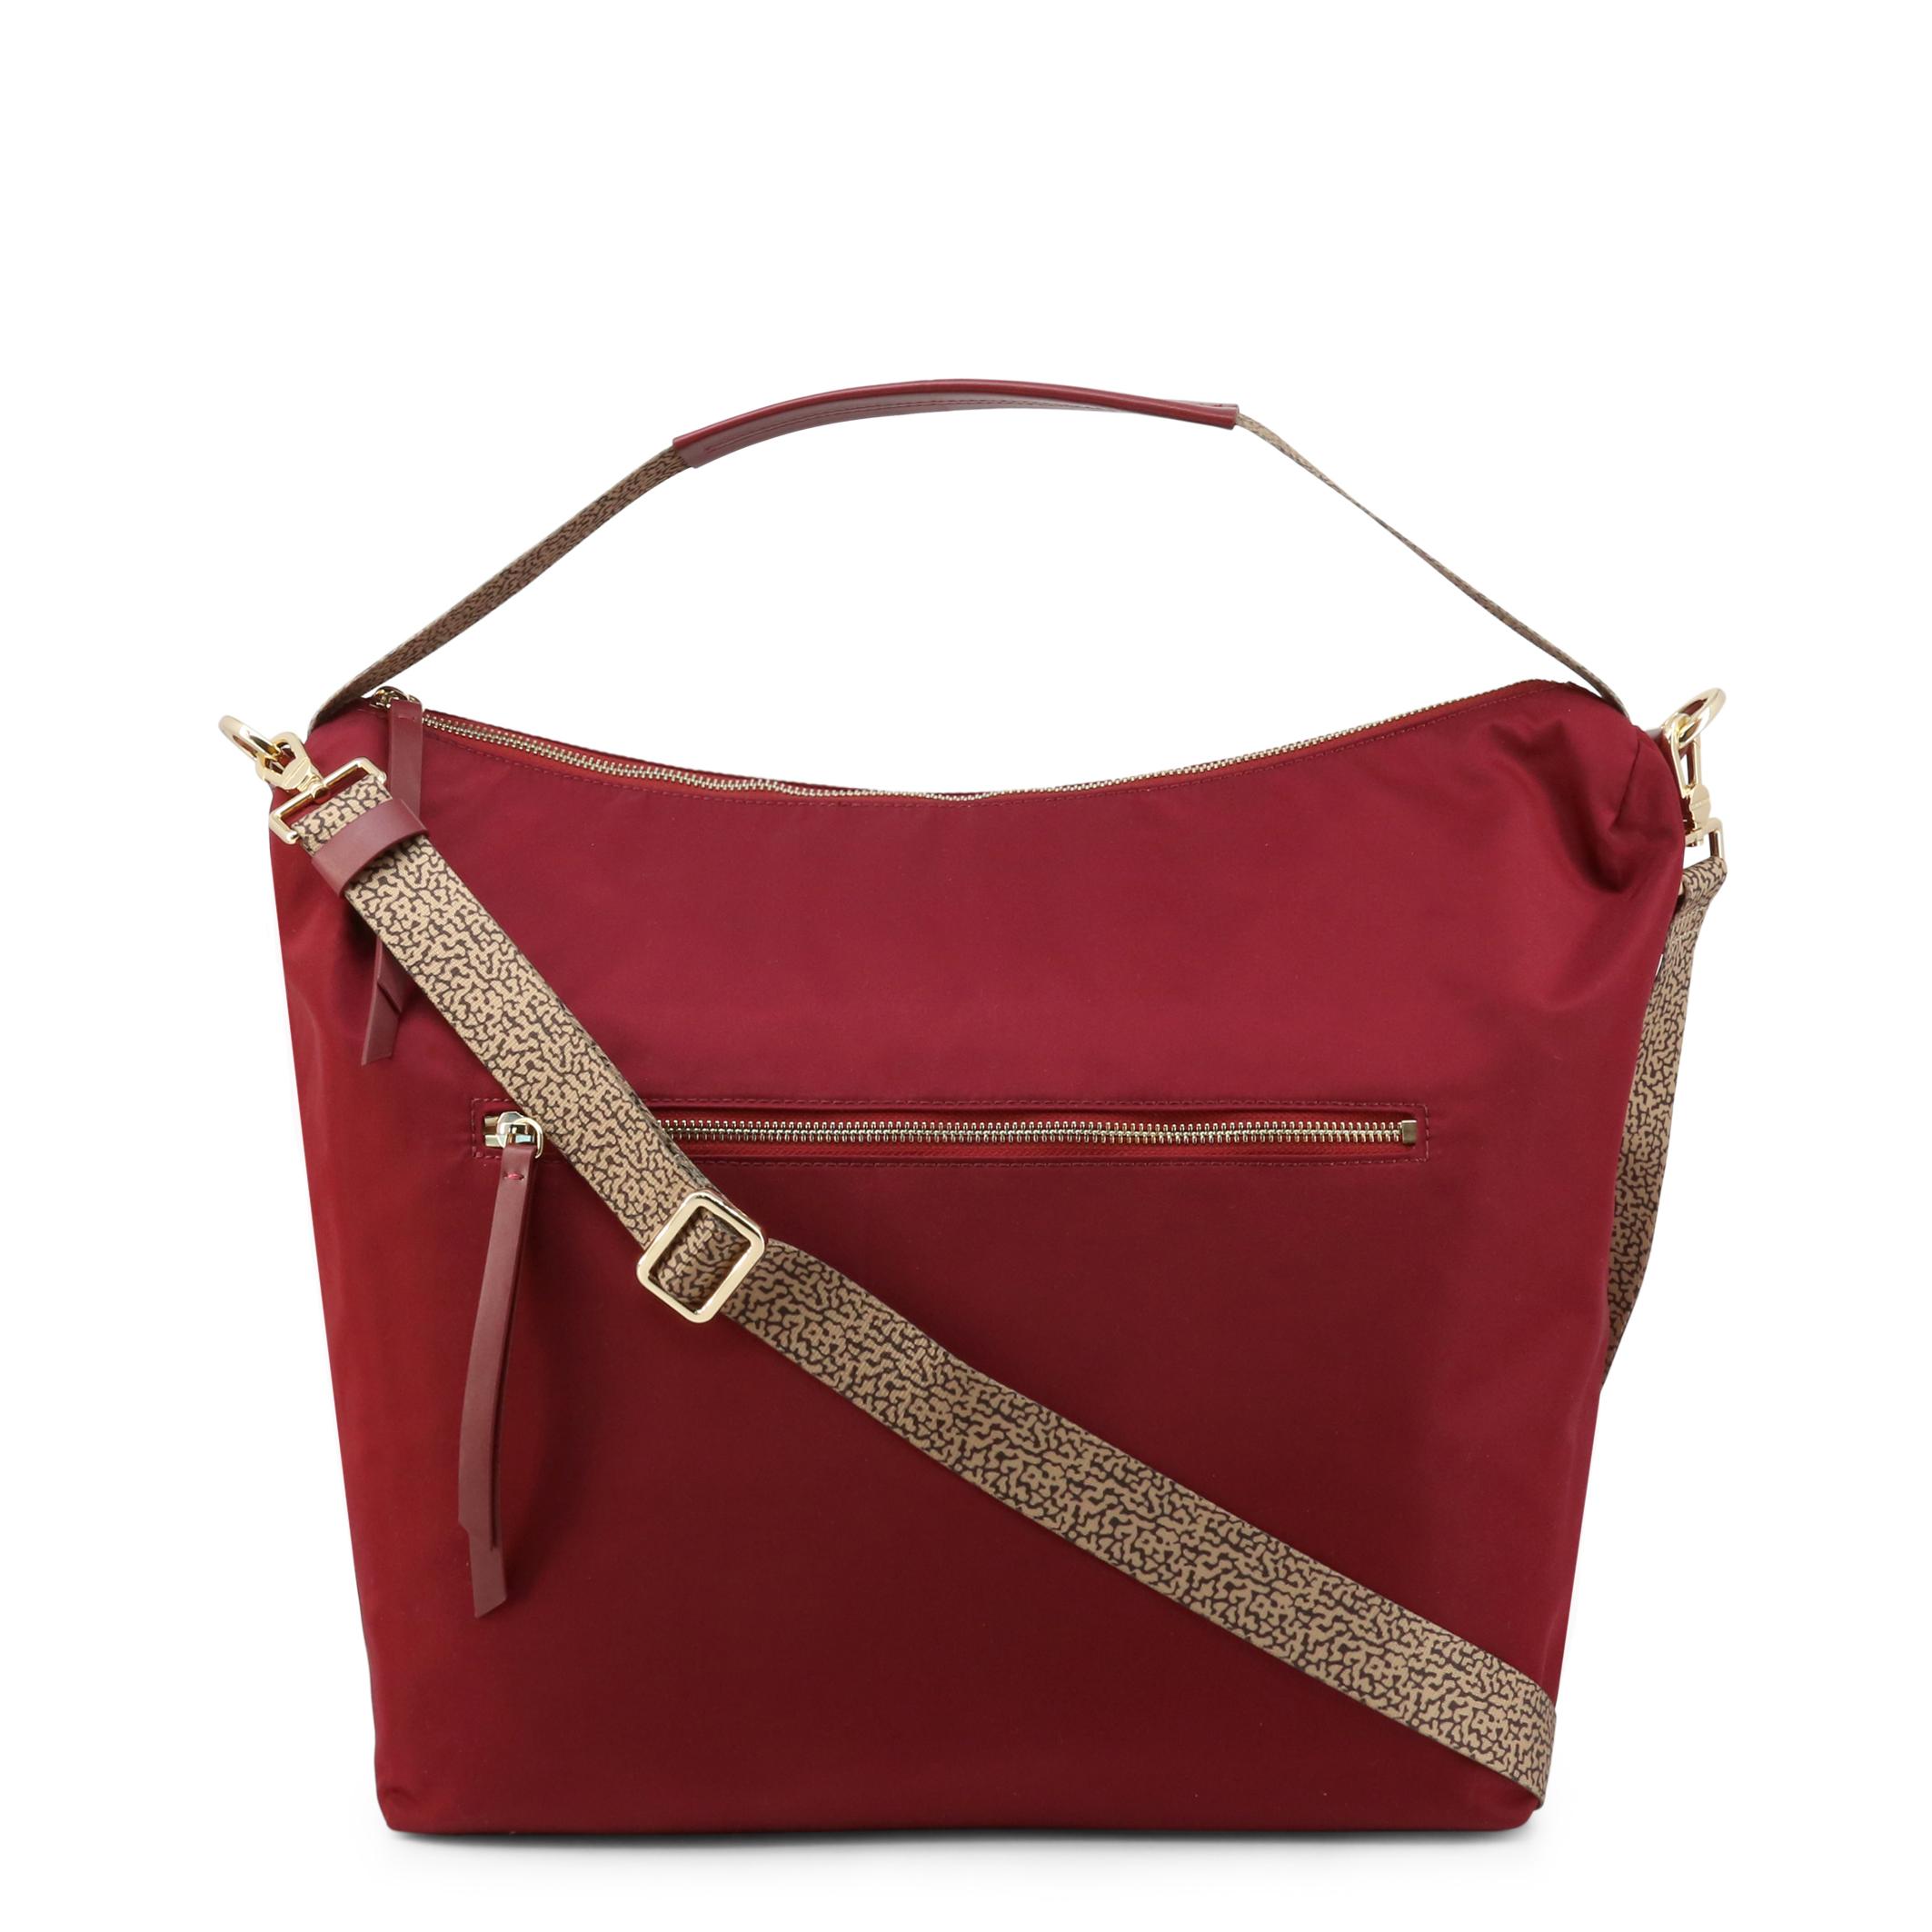 Borbonese - 924079-138 - Red